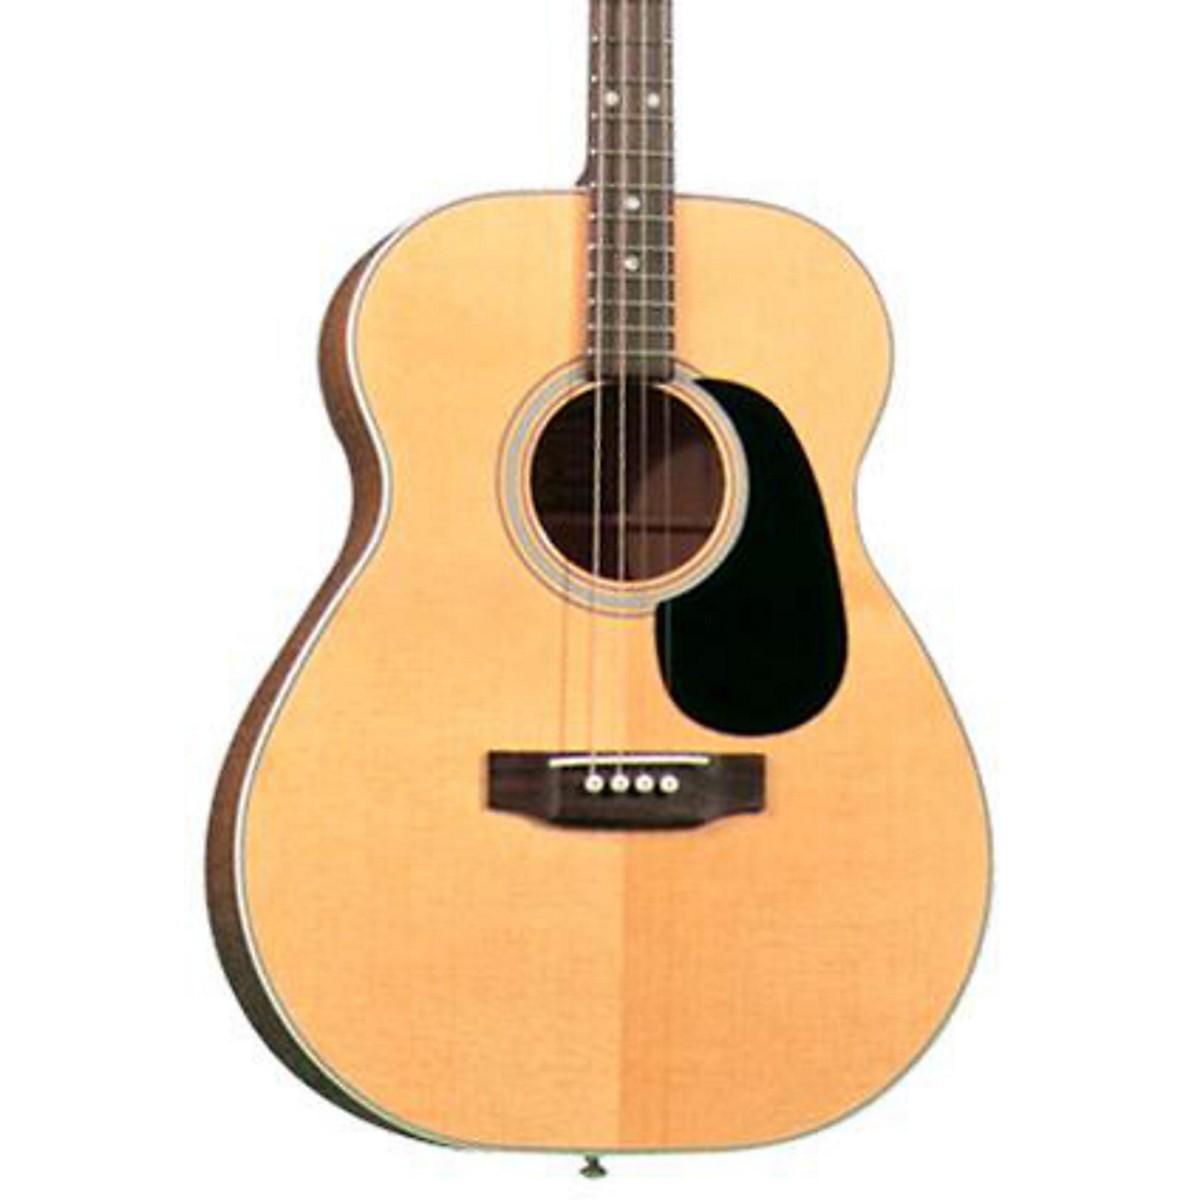 Blueridge BR-60T Contemporary Series Tenor Guitar